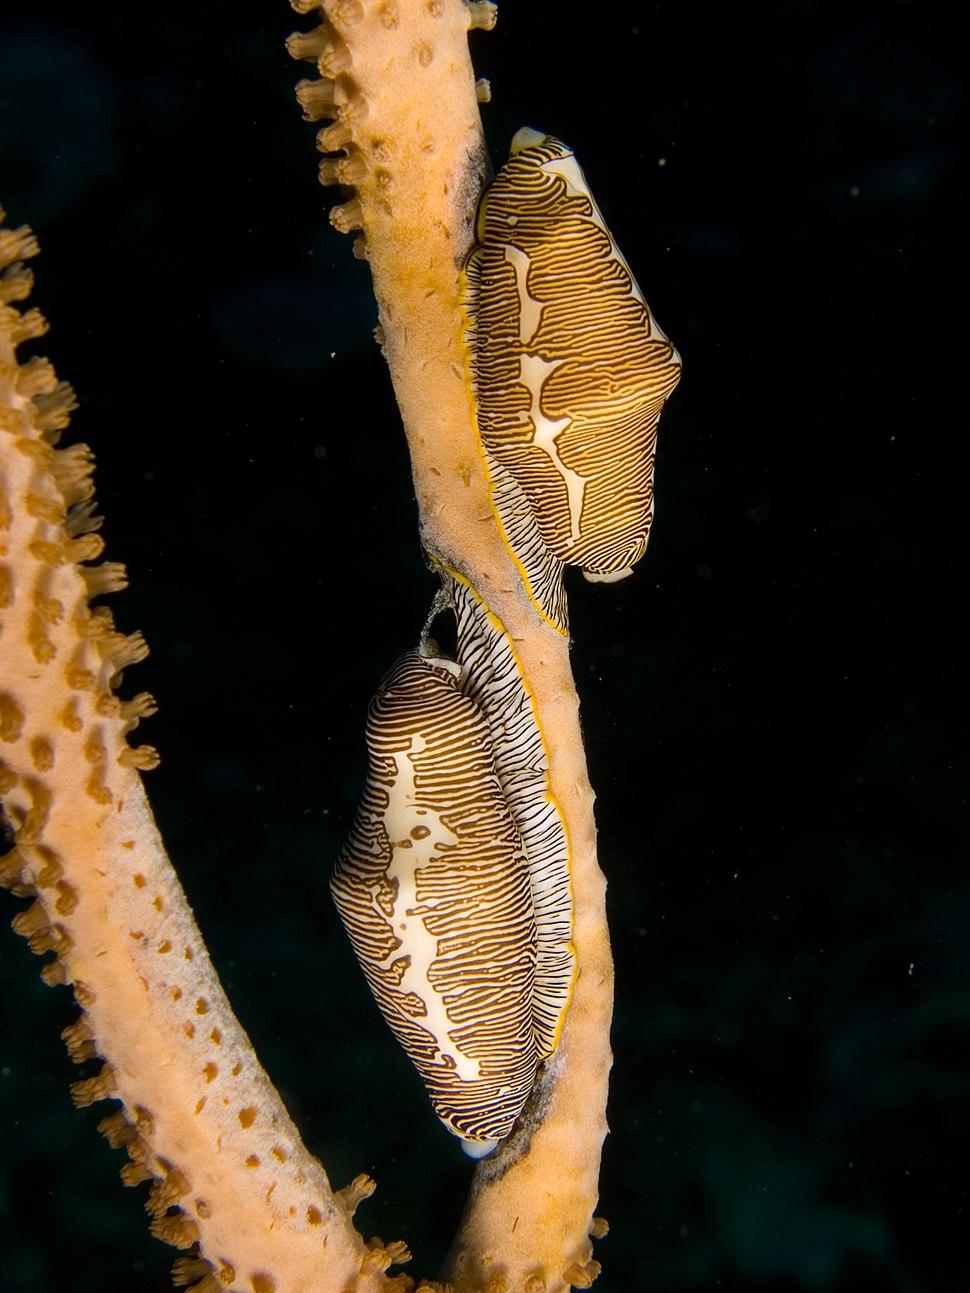 Cyphoma signata (Fingerprint Cowry) pair